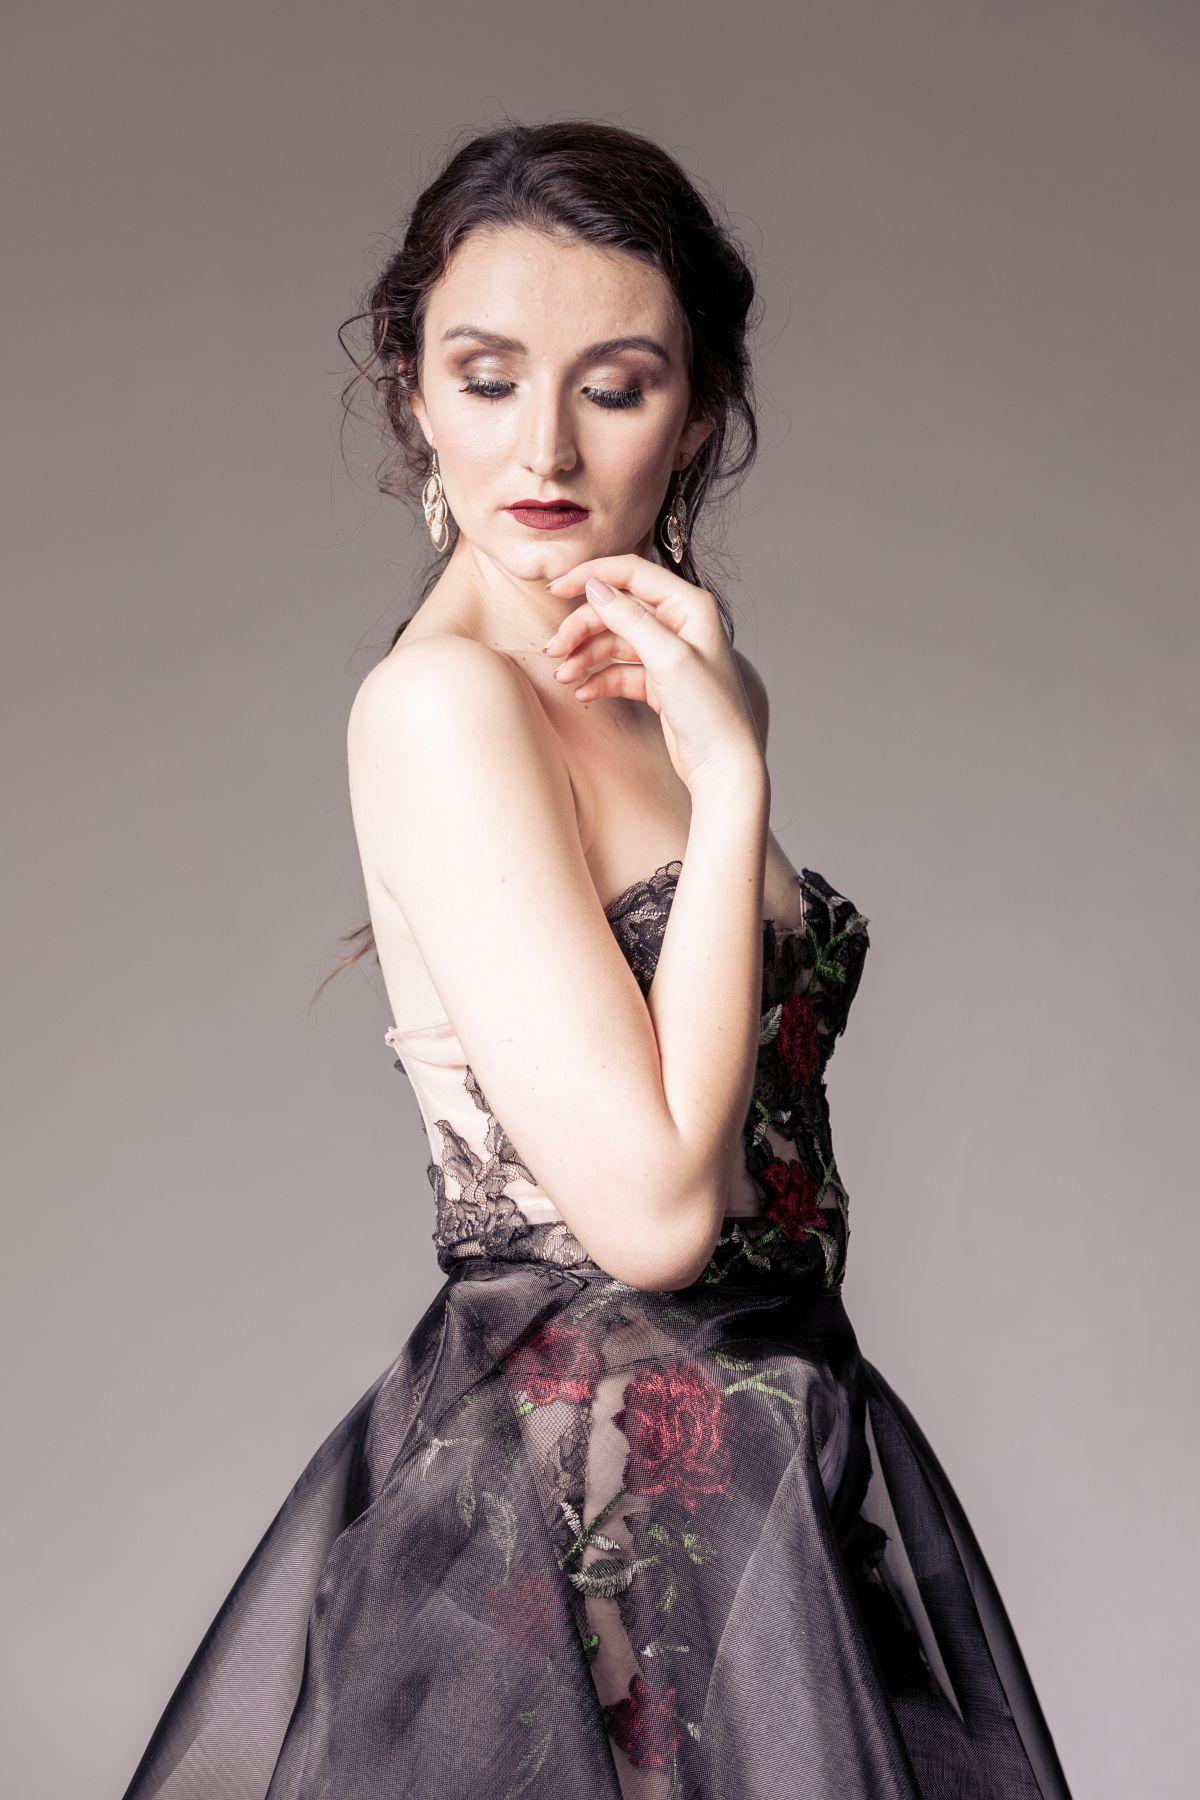 Amoné Bester Black Couture Dress|Couture South Africa|Black Couture Gown|Black And Red Dress South Africa|Black Lace Couture Dress